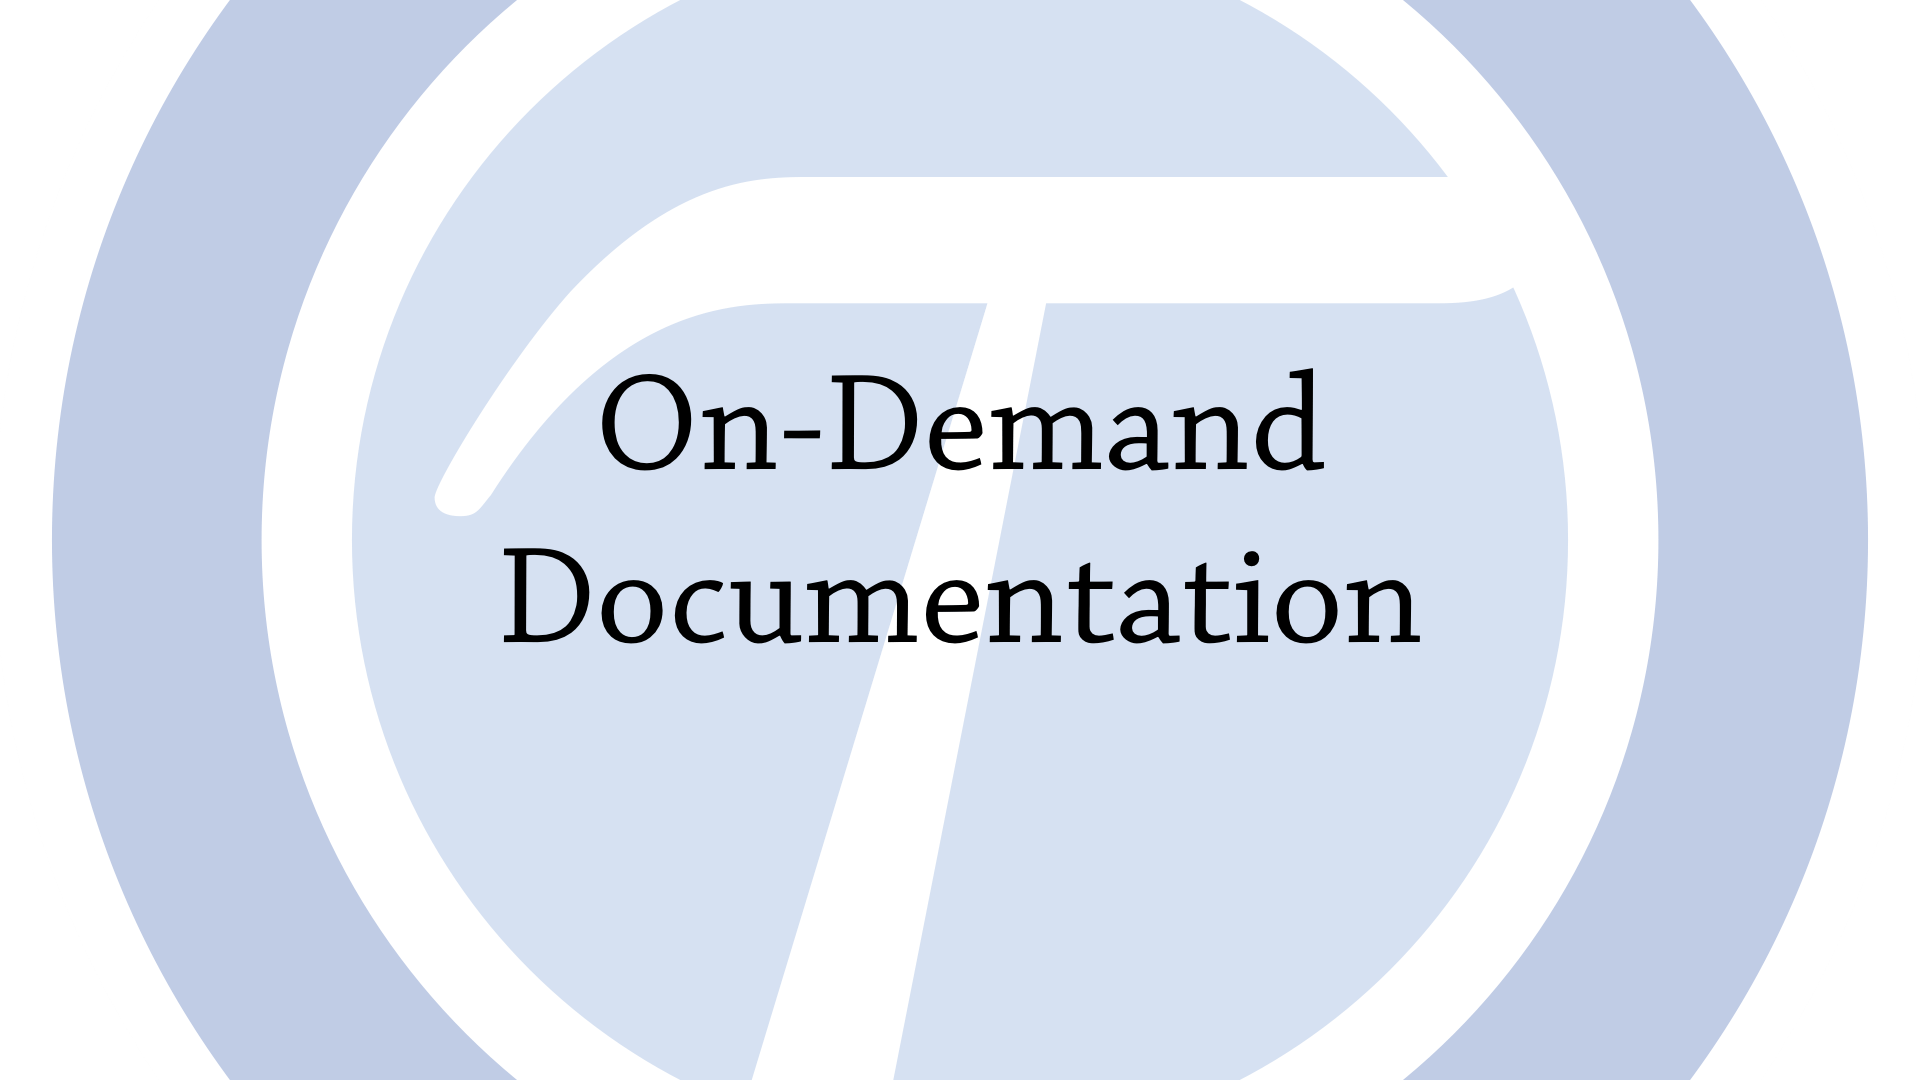 On demand documentation